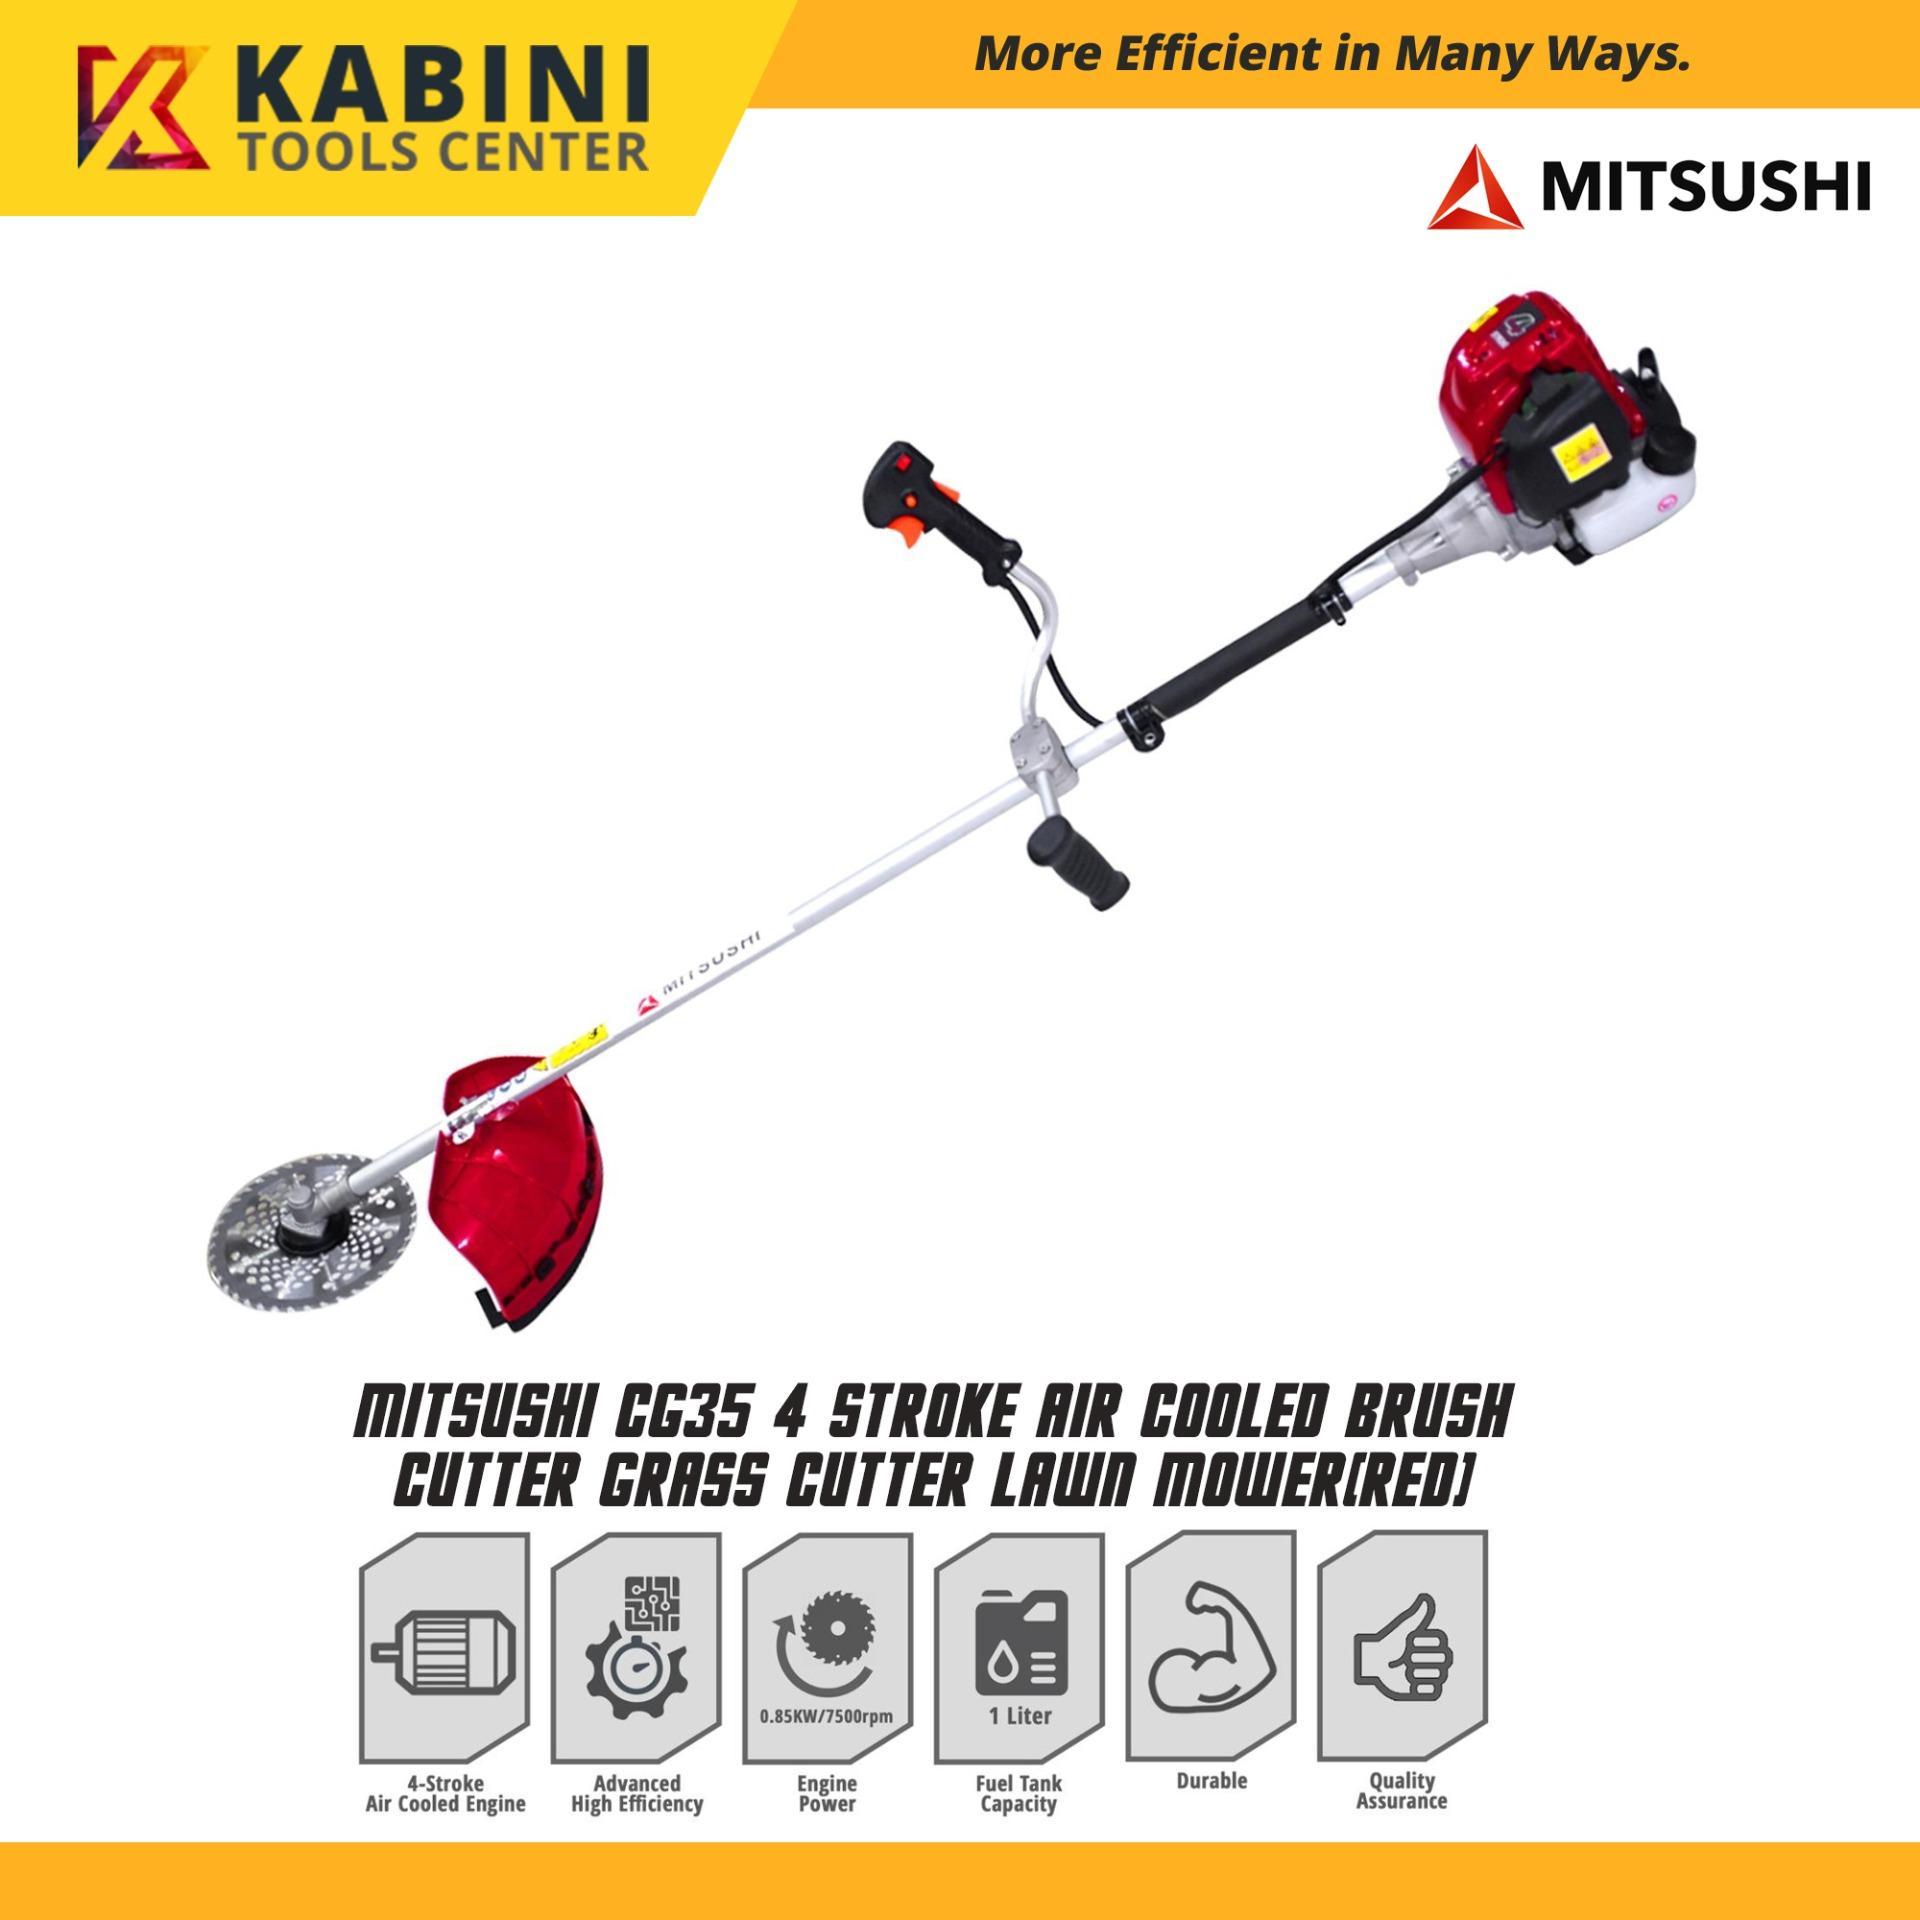 Mitsushi CG35 4 Stroke Air Cooled Brush Cutter Grass Cutter Lawn Mower